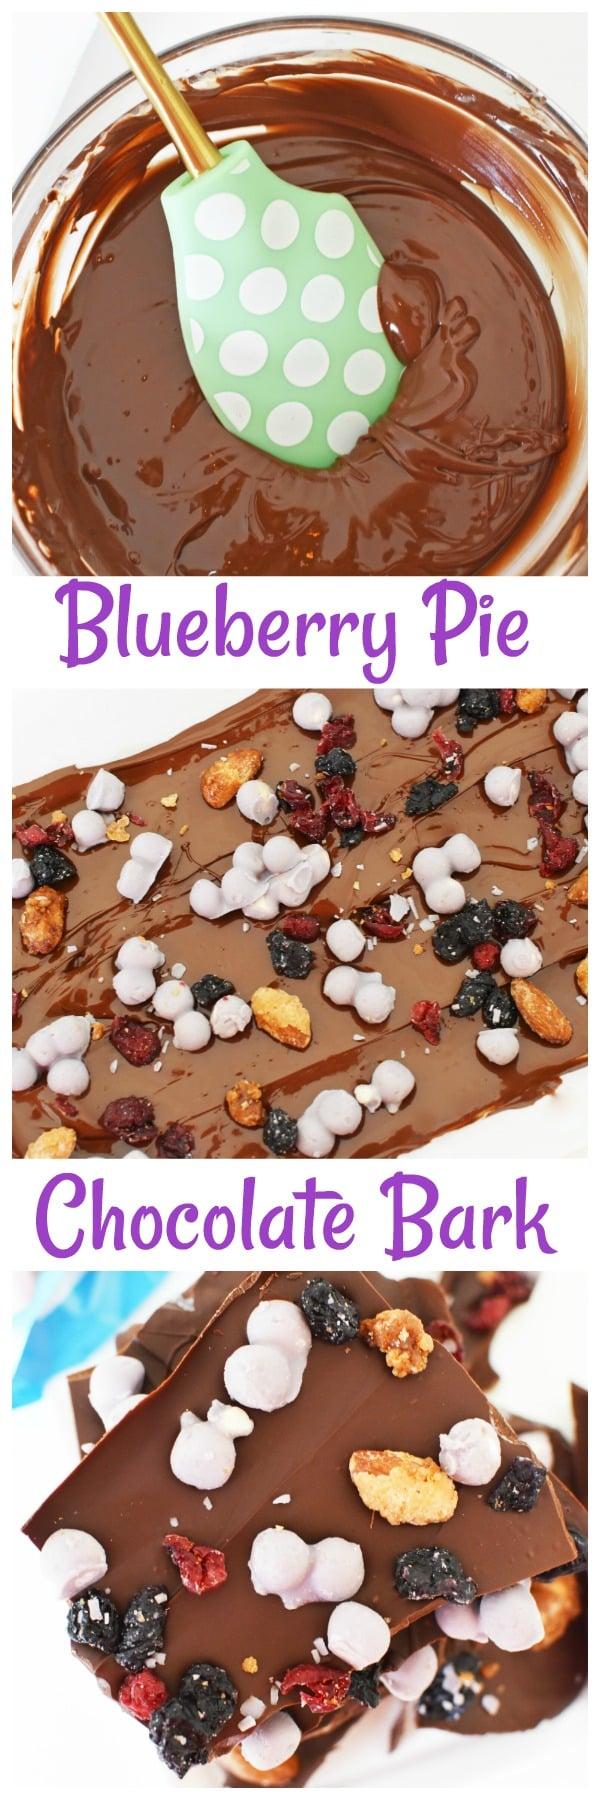 Nutritious Blueberry Pie Chocolate Bark